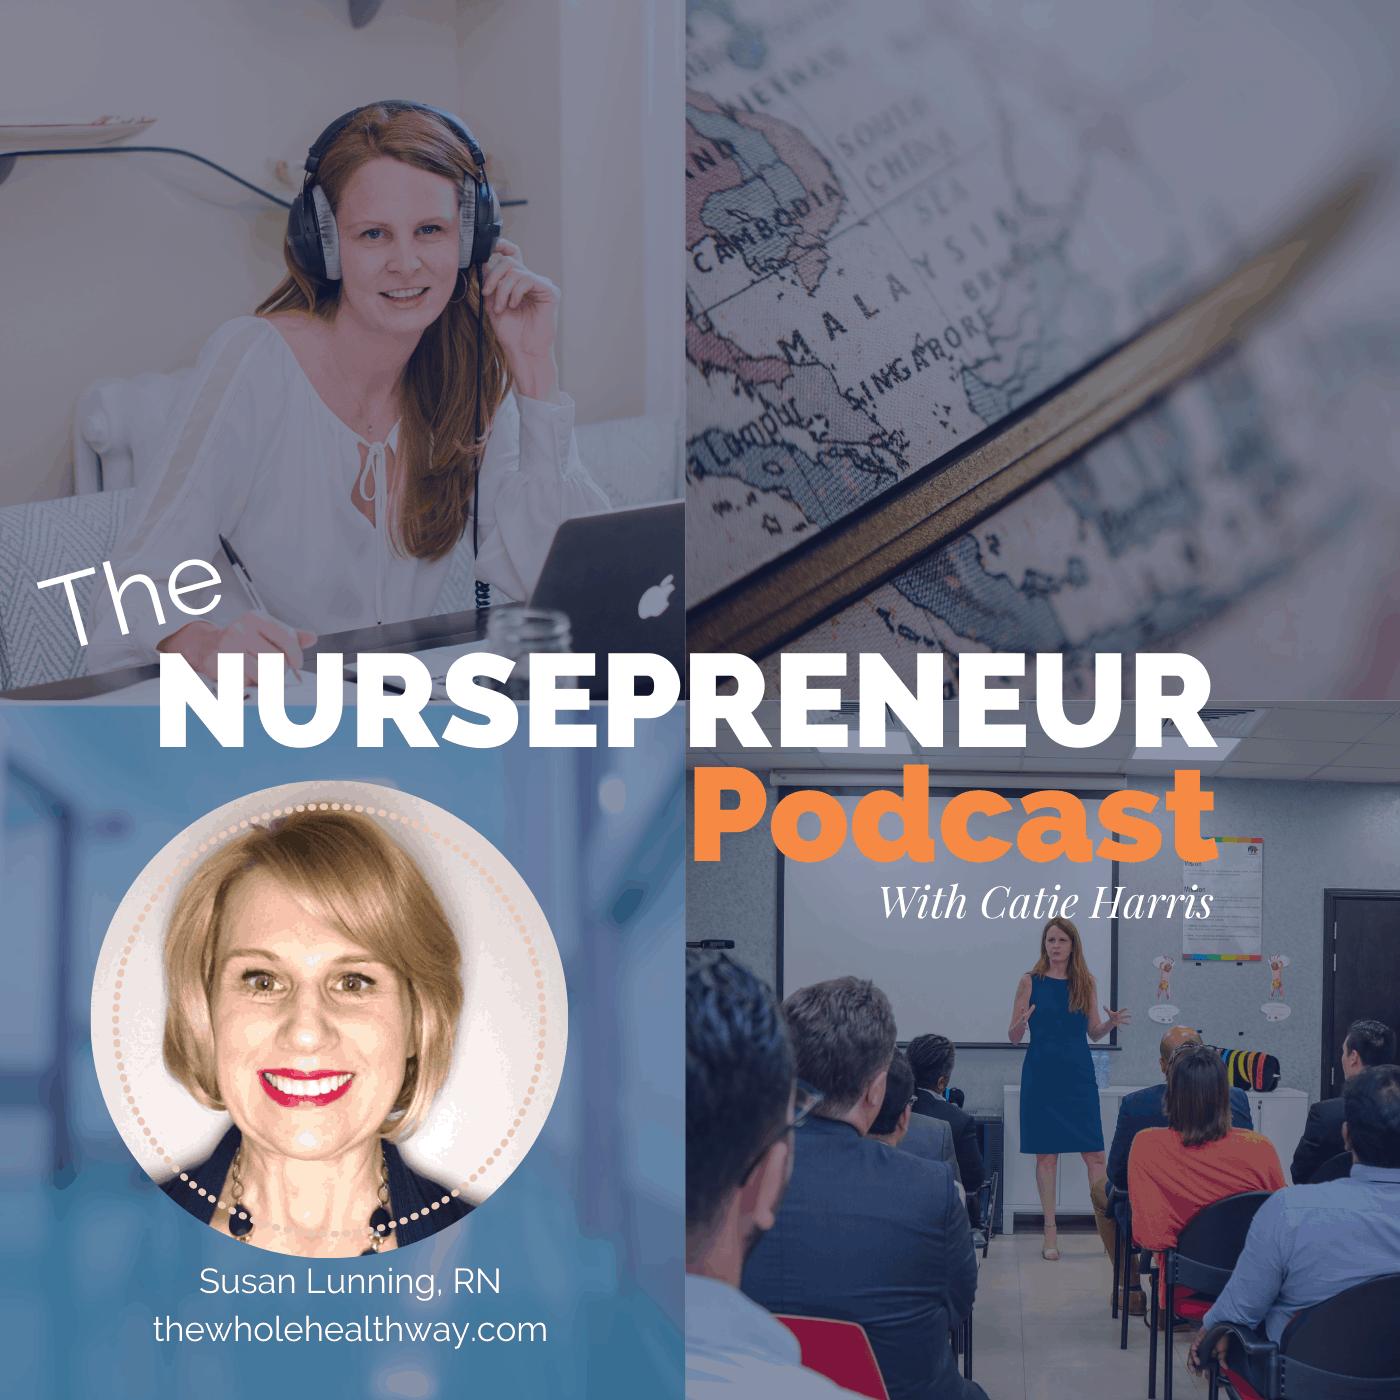 The Whole Health Way NursePreneur Podcast